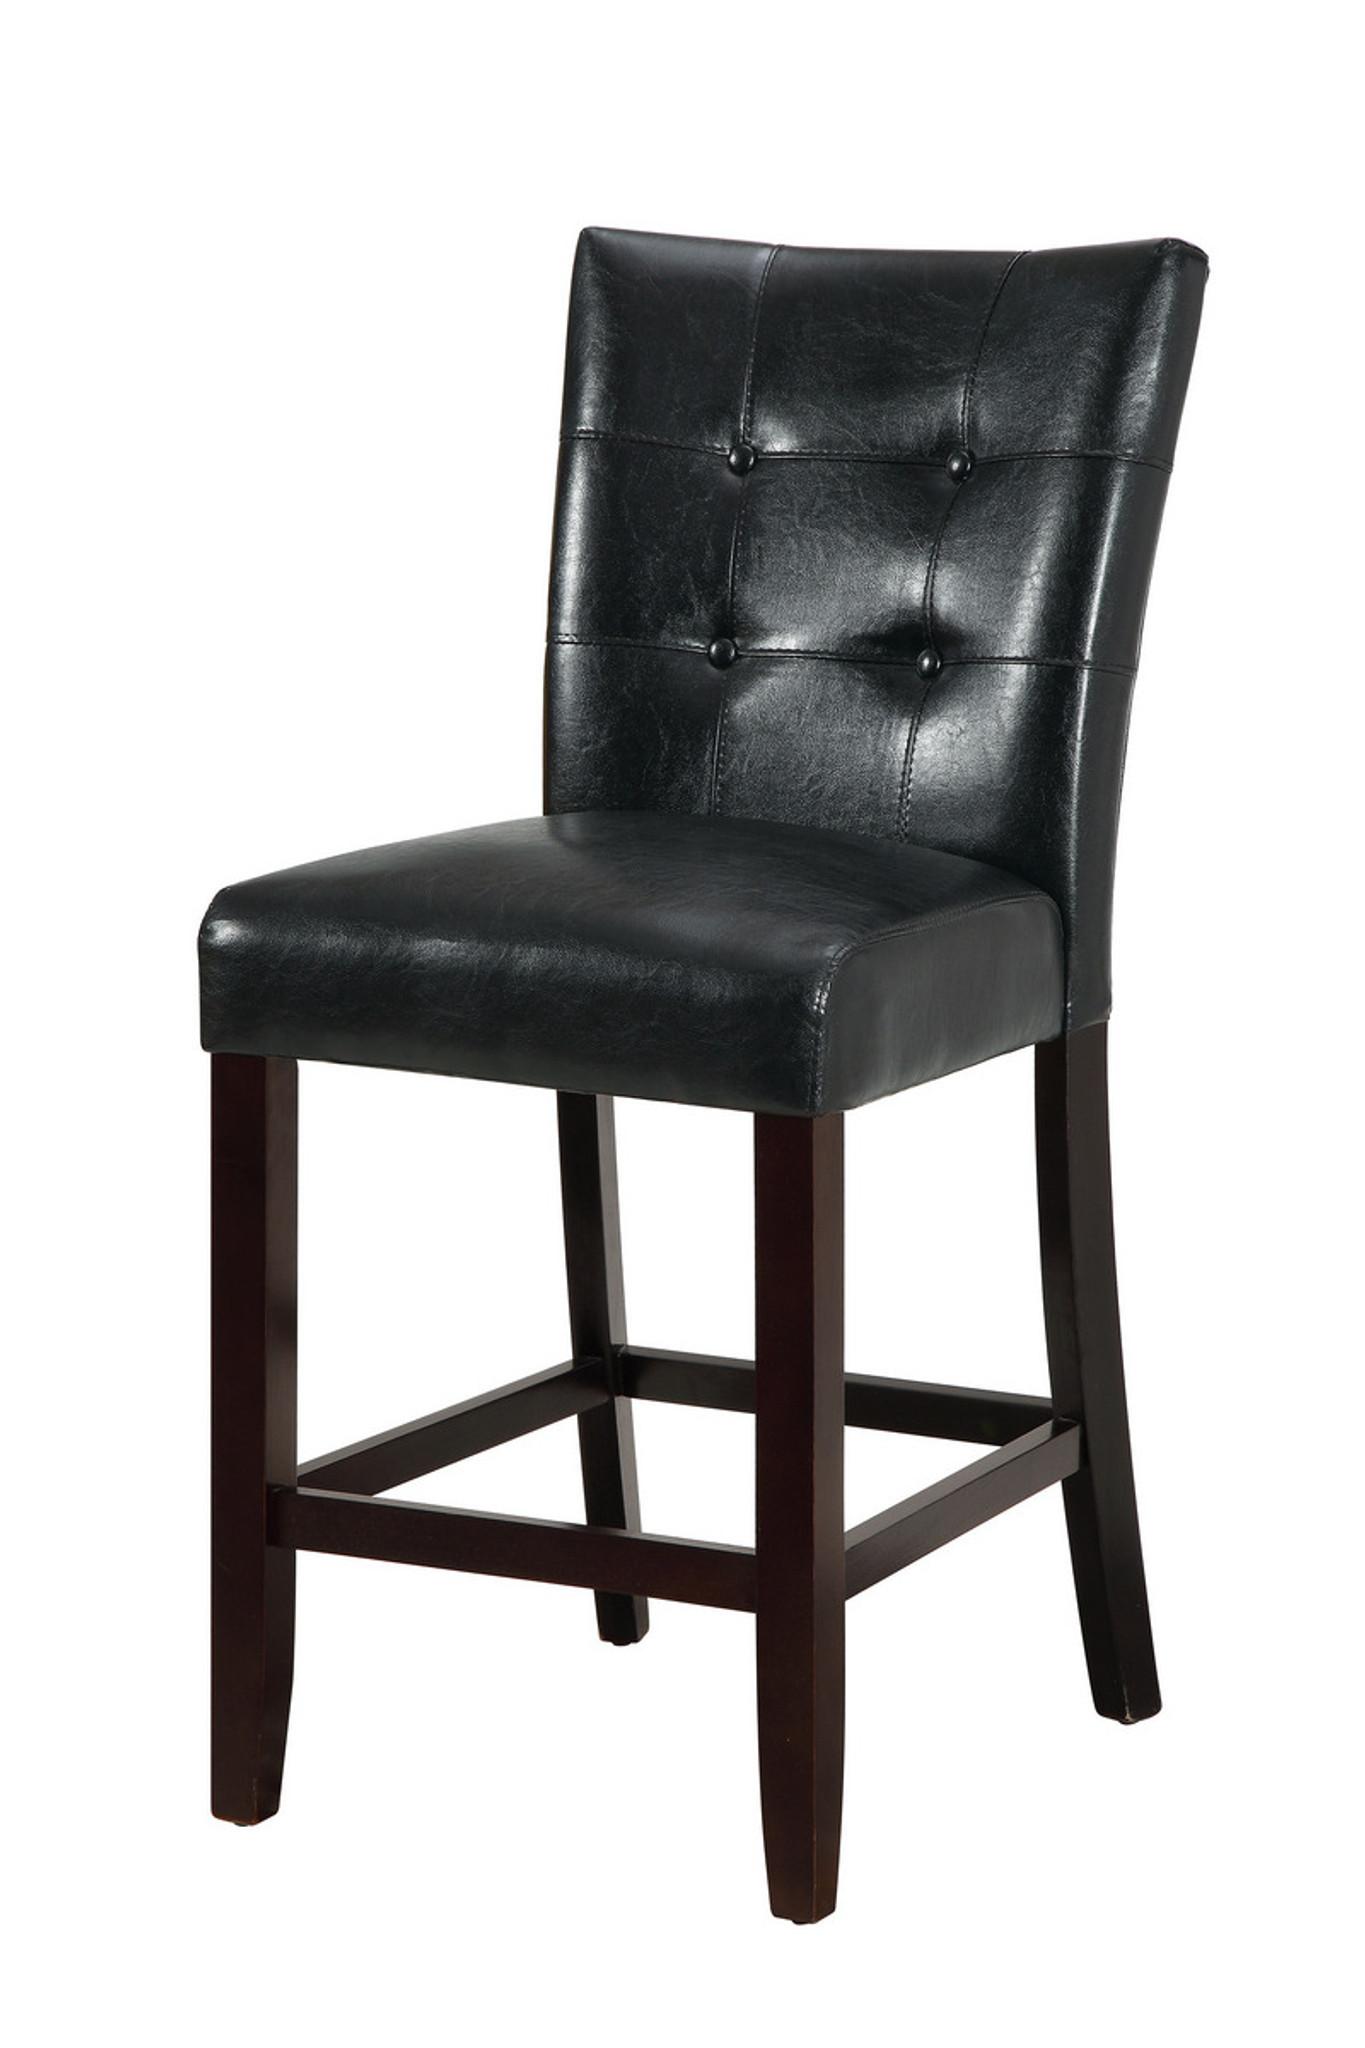 Pleasing 2Pcs Black Pu High Chair Set Dailytribune Chair Design For Home Dailytribuneorg